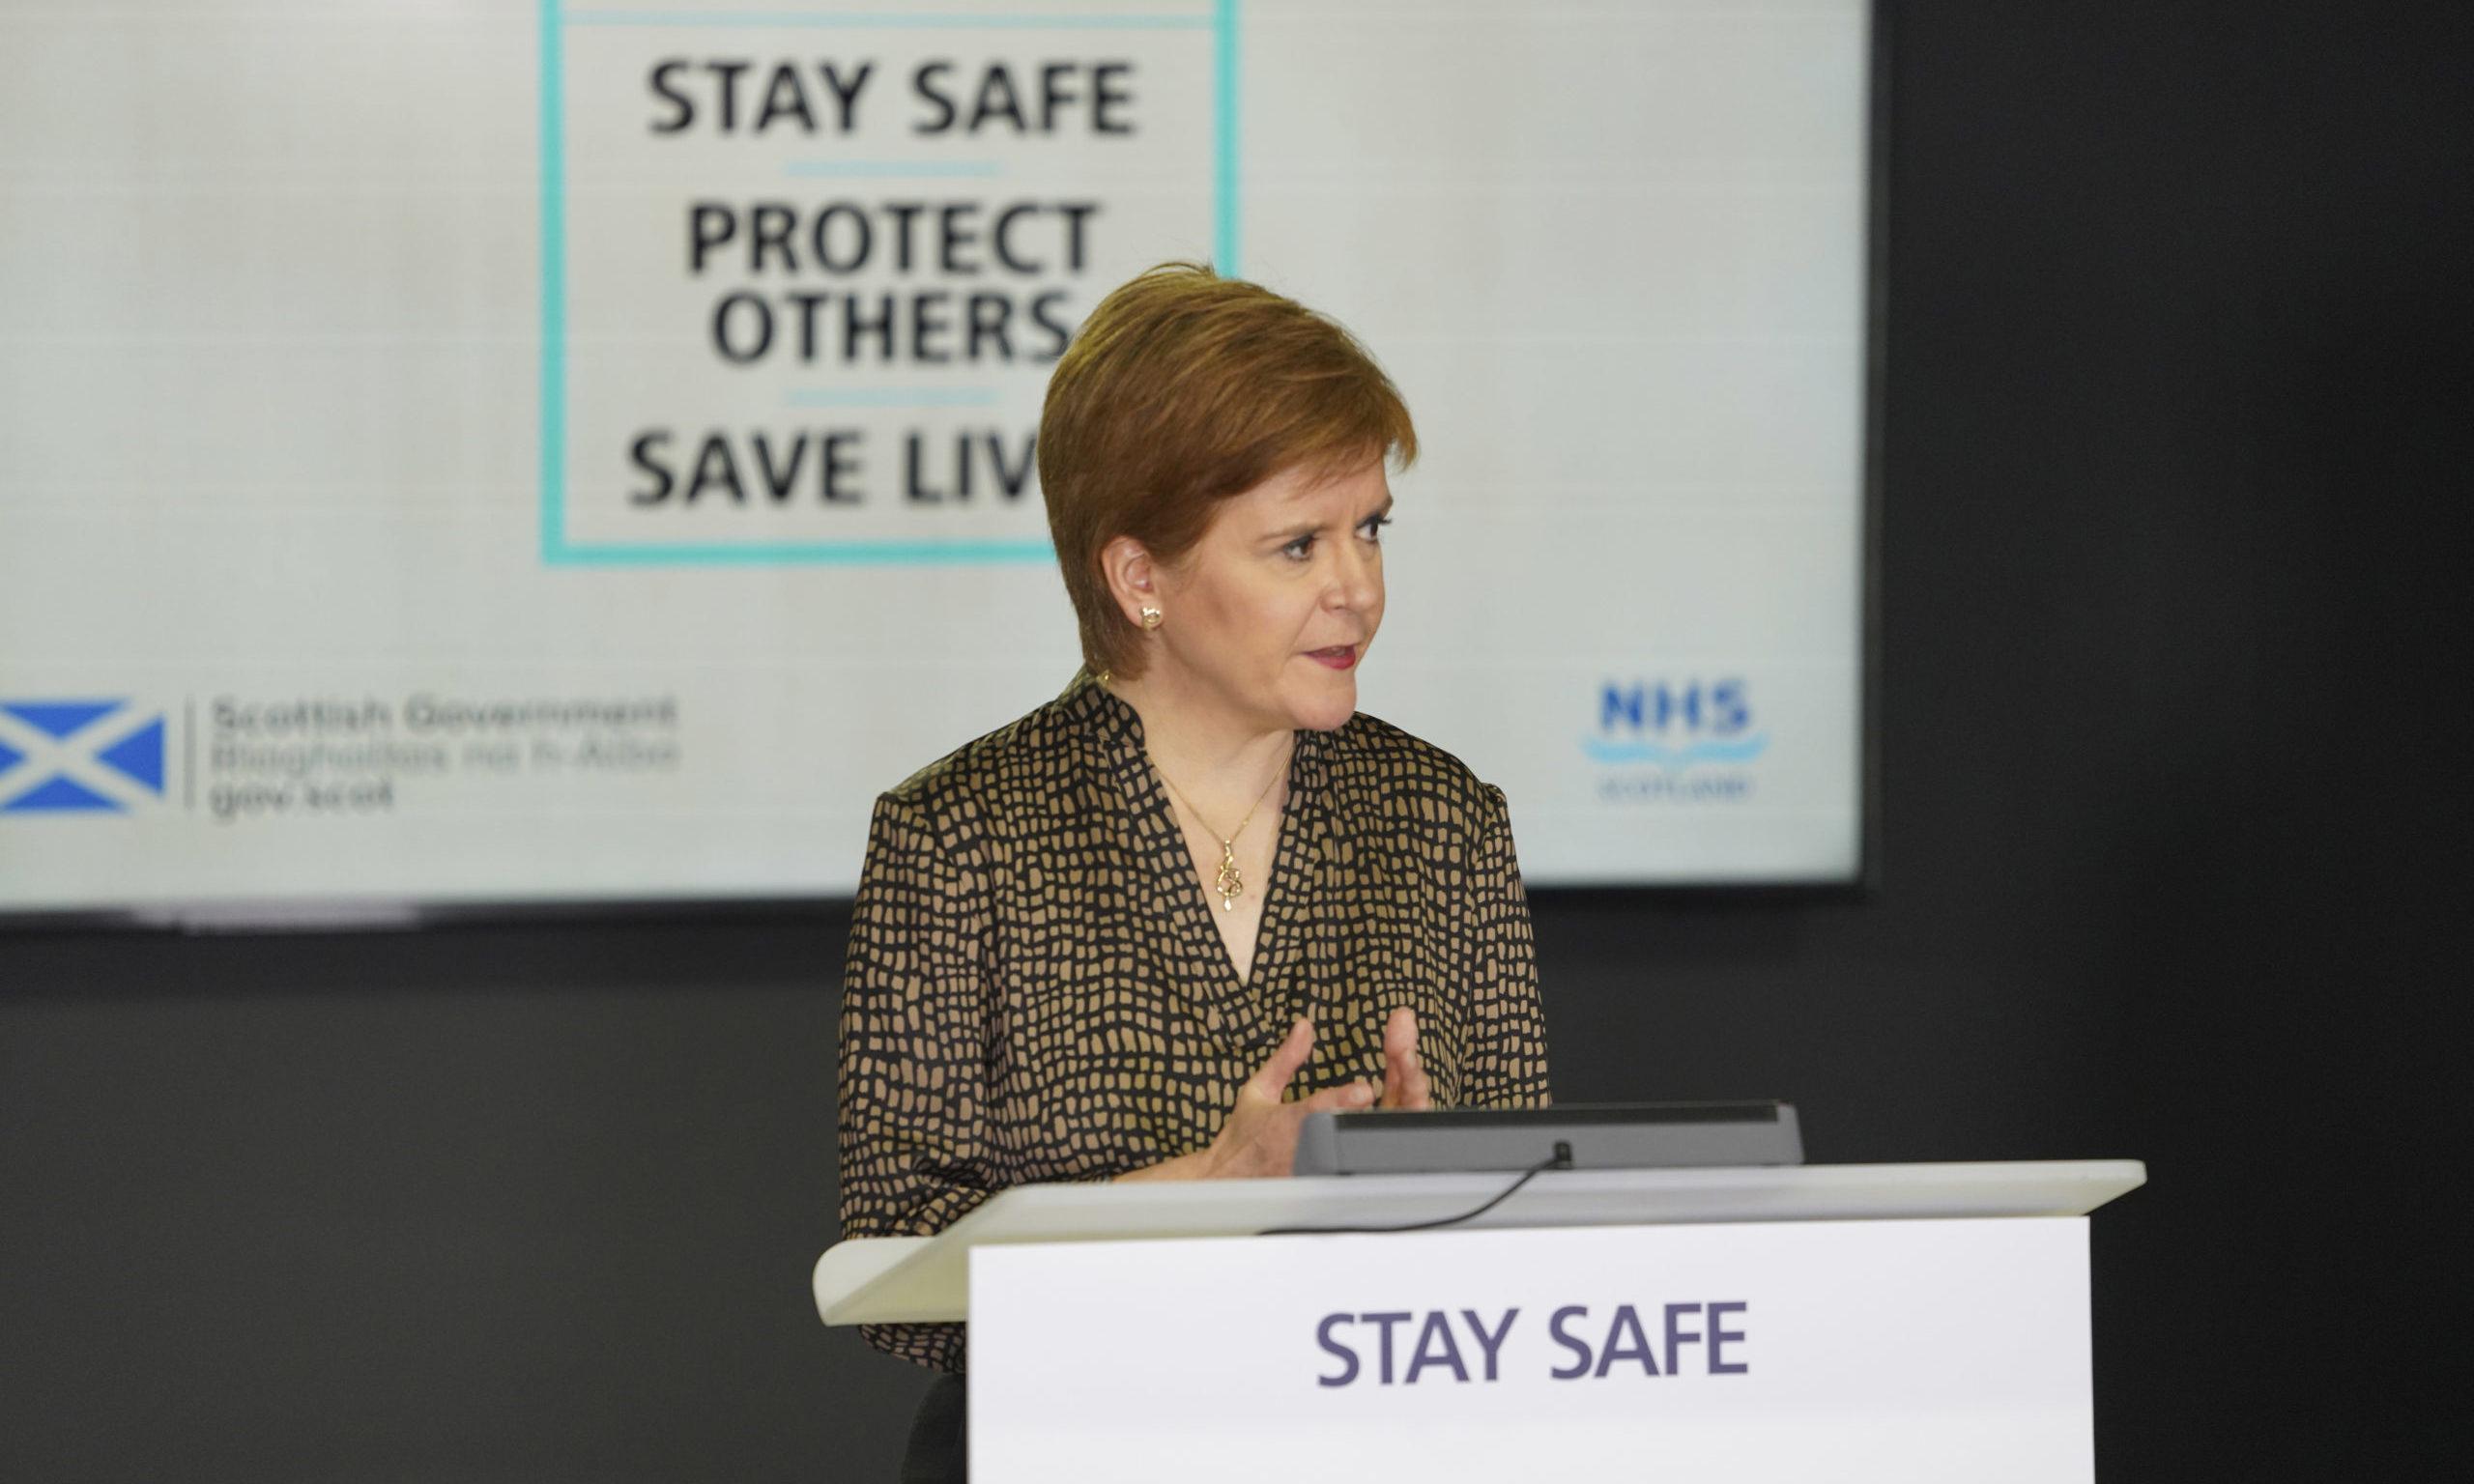 Nicola Sturgeon announced the funding pot today